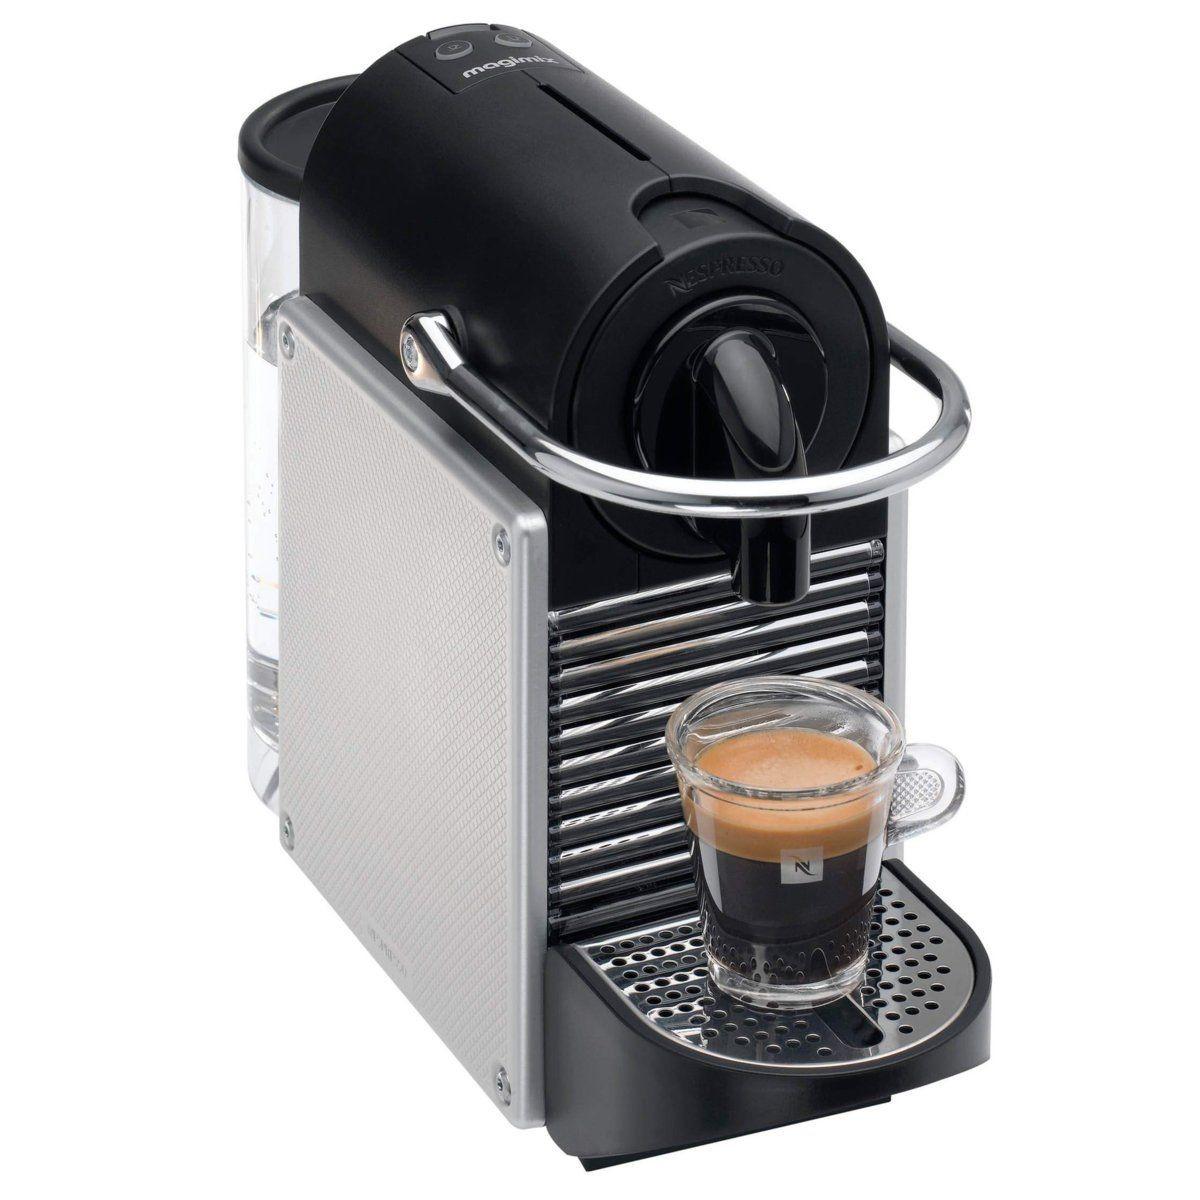 Nespresso PIXIE M110, 11322 Nespresso, Coffee maker, Coffee